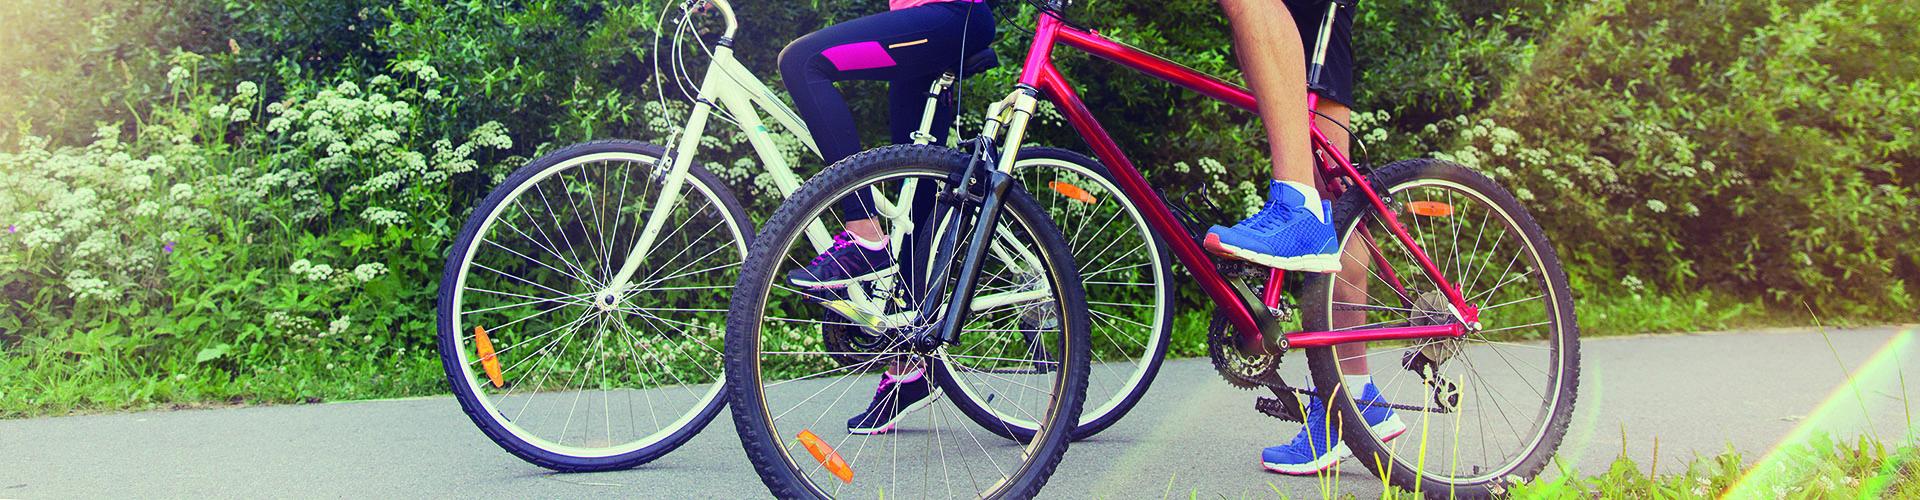 slider-fietsen1